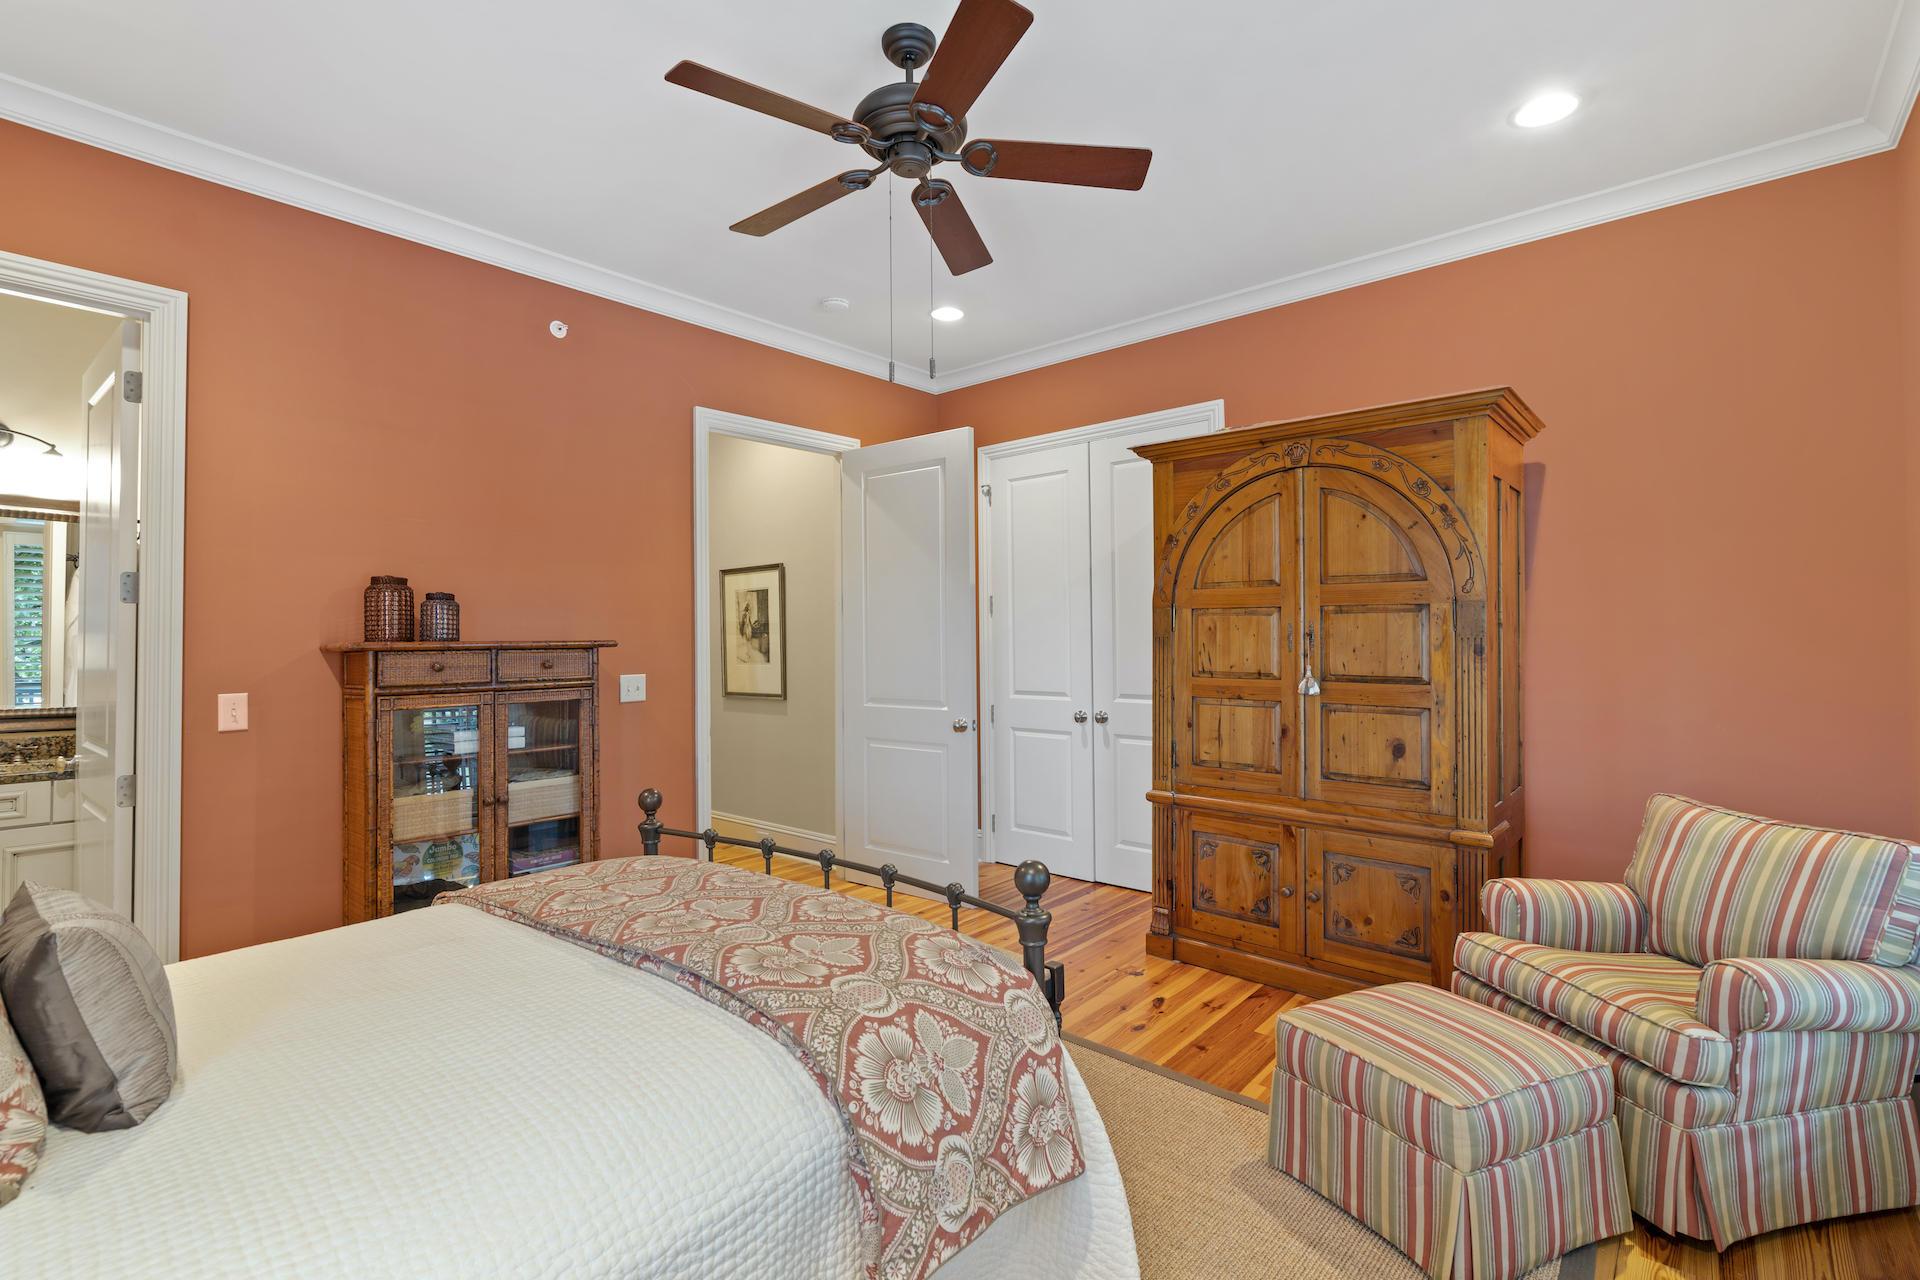 Daniel Island Homes For Sale - 250 Island Park, Charleston, SC - 0